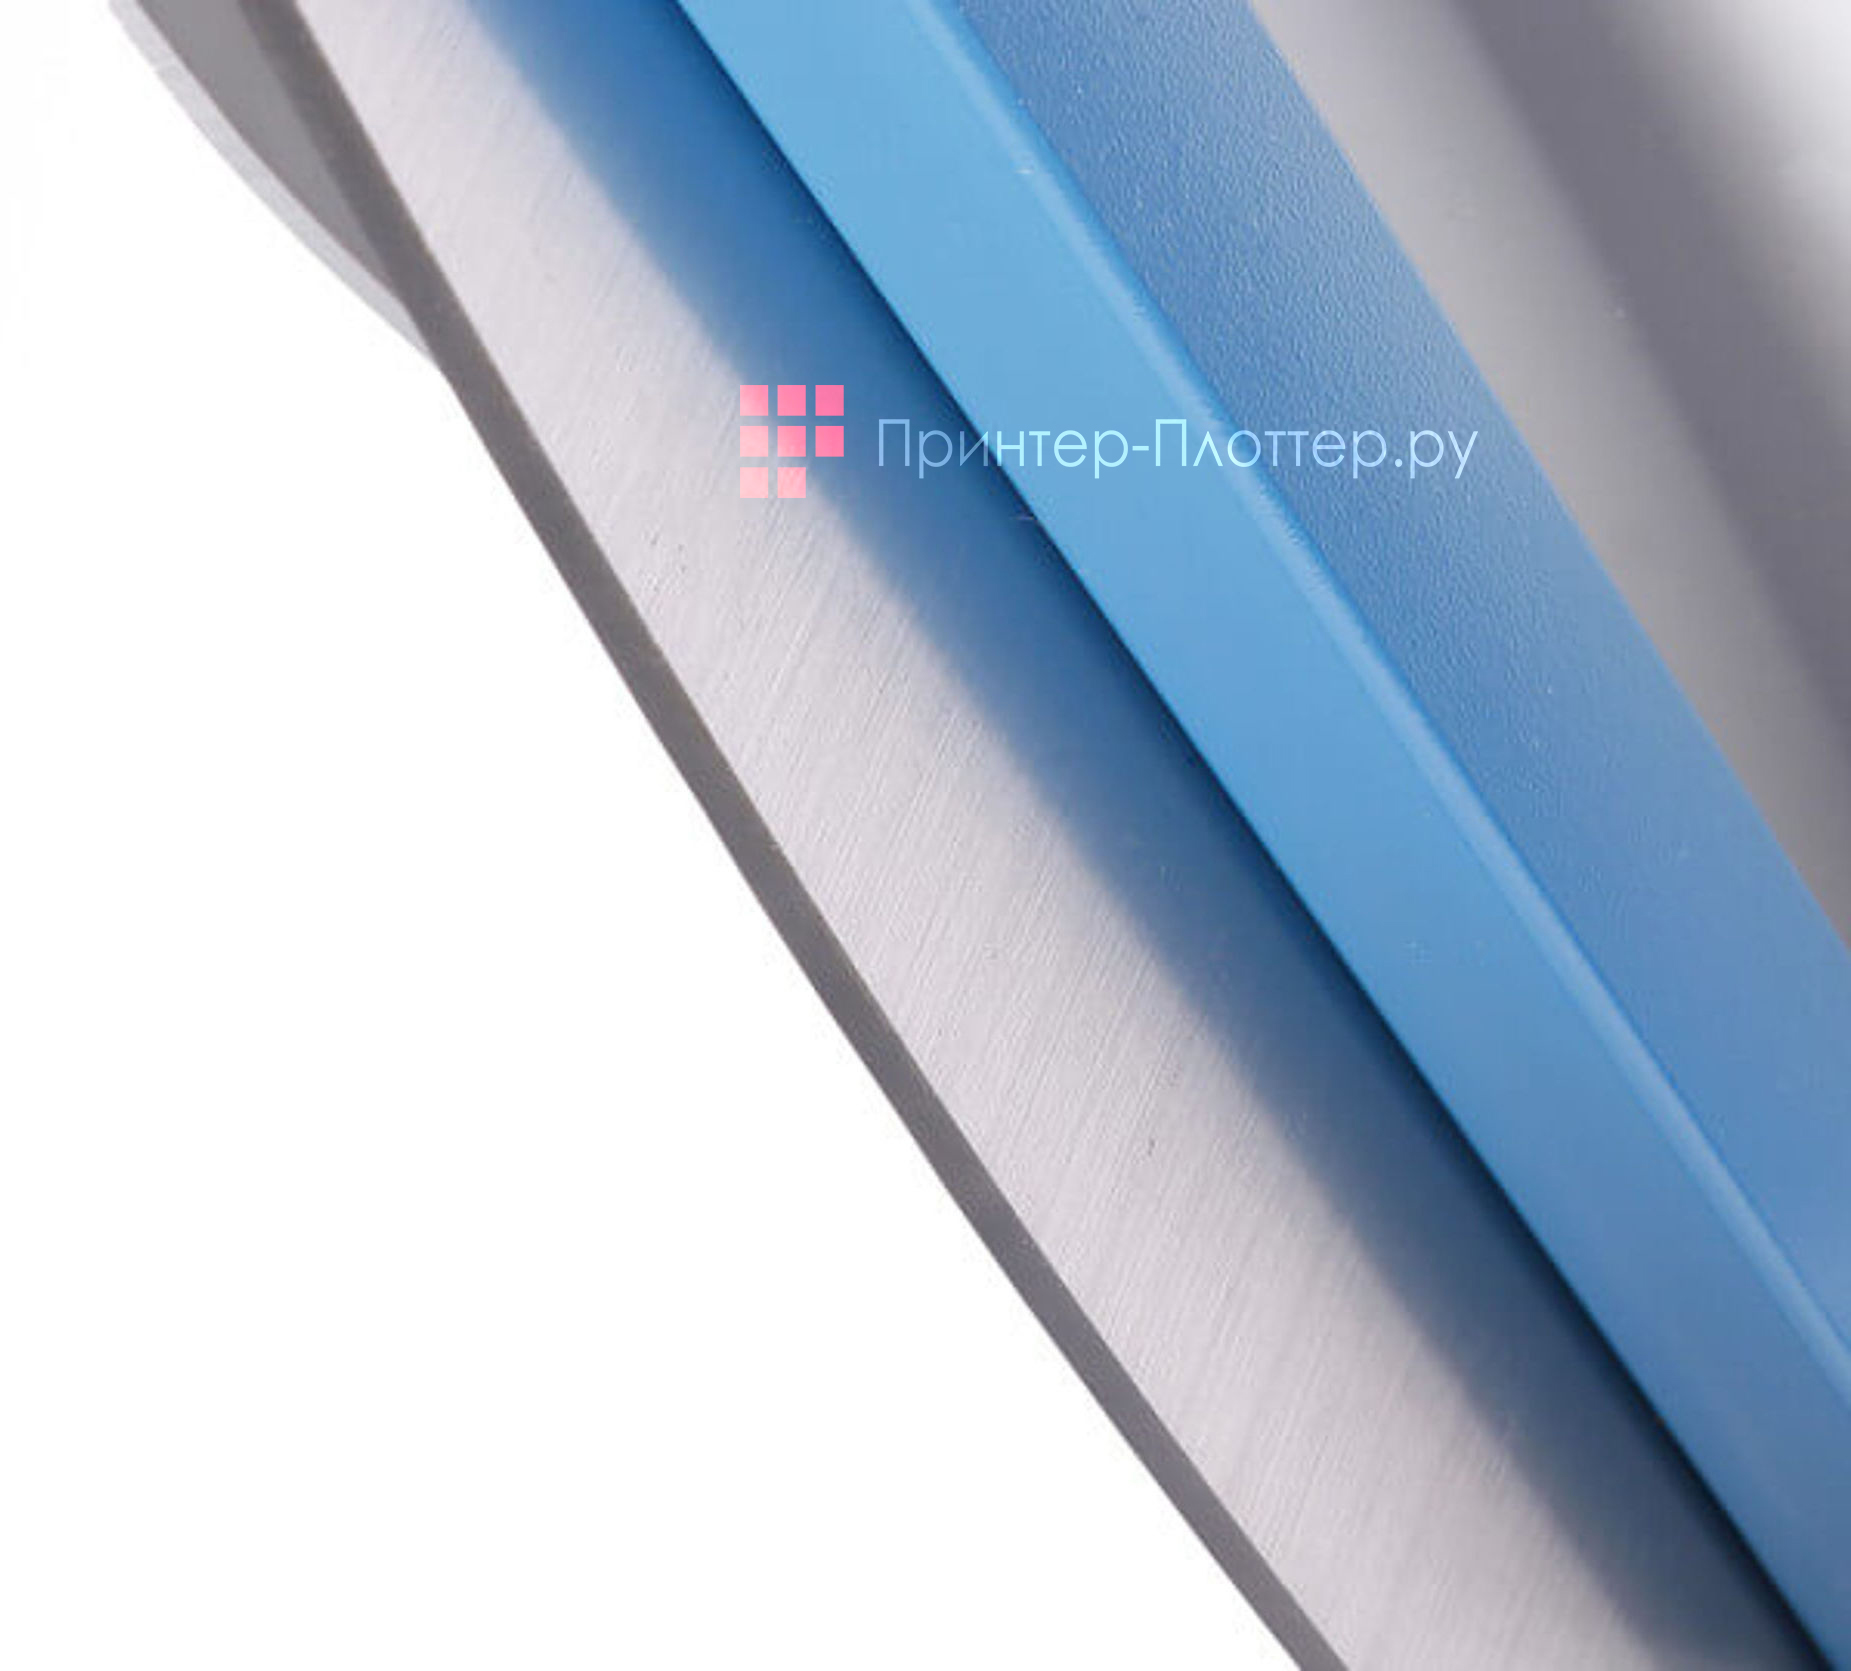 Dahle 565. Нож для материалов